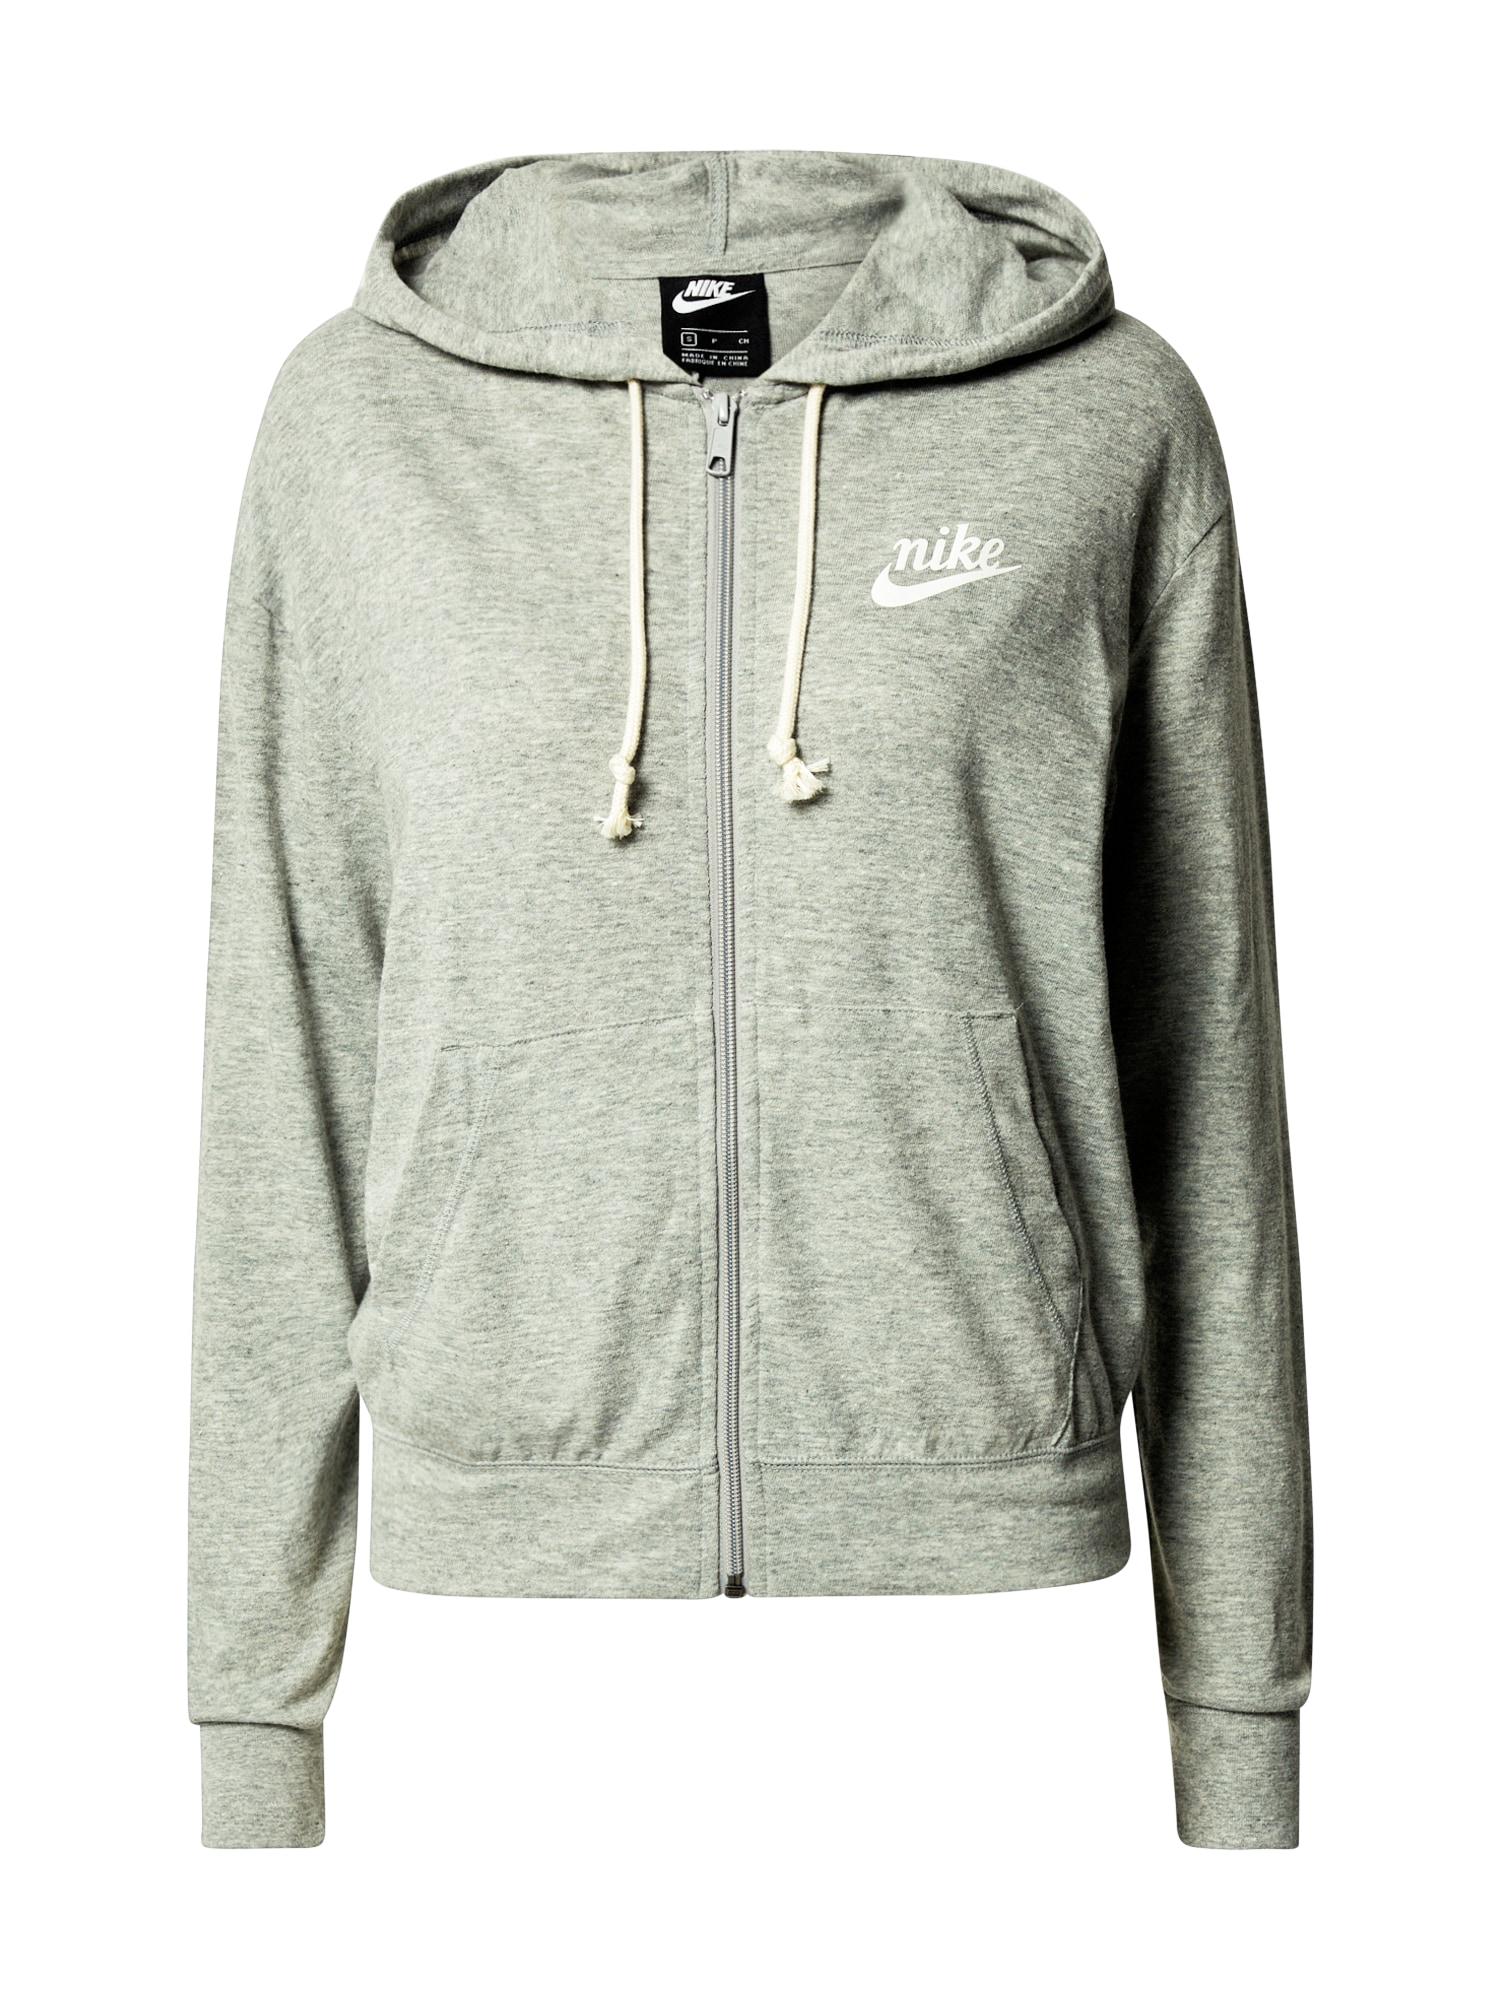 Nike Sportswear Džemperis margai pilka / balta